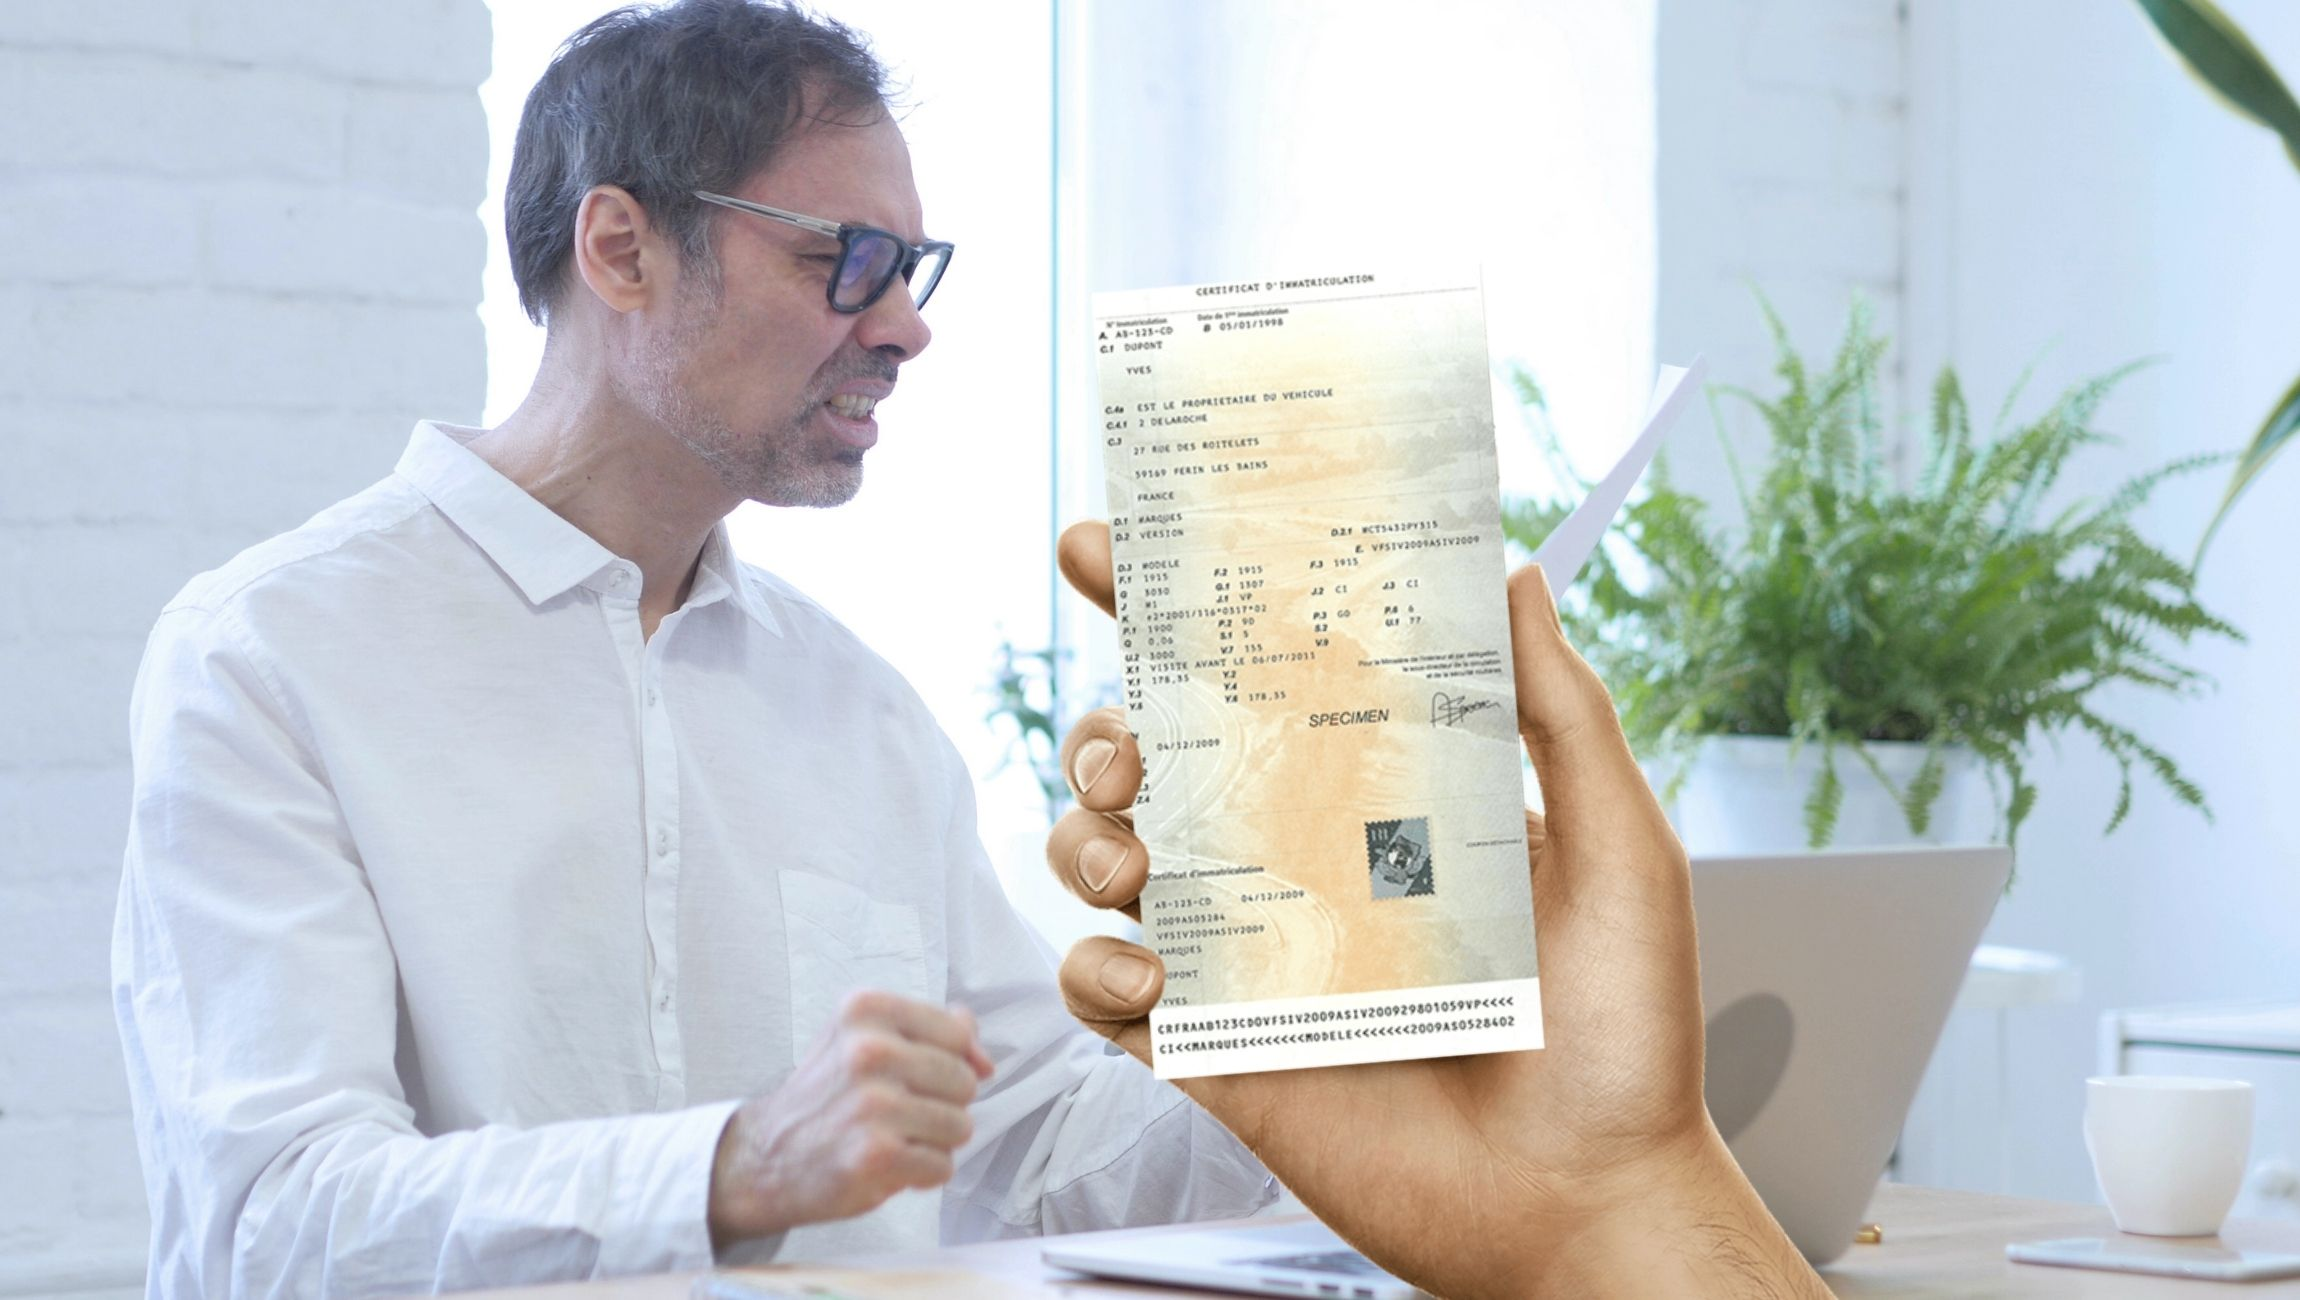 Perte de carte grise : demande de duplicata en ligne